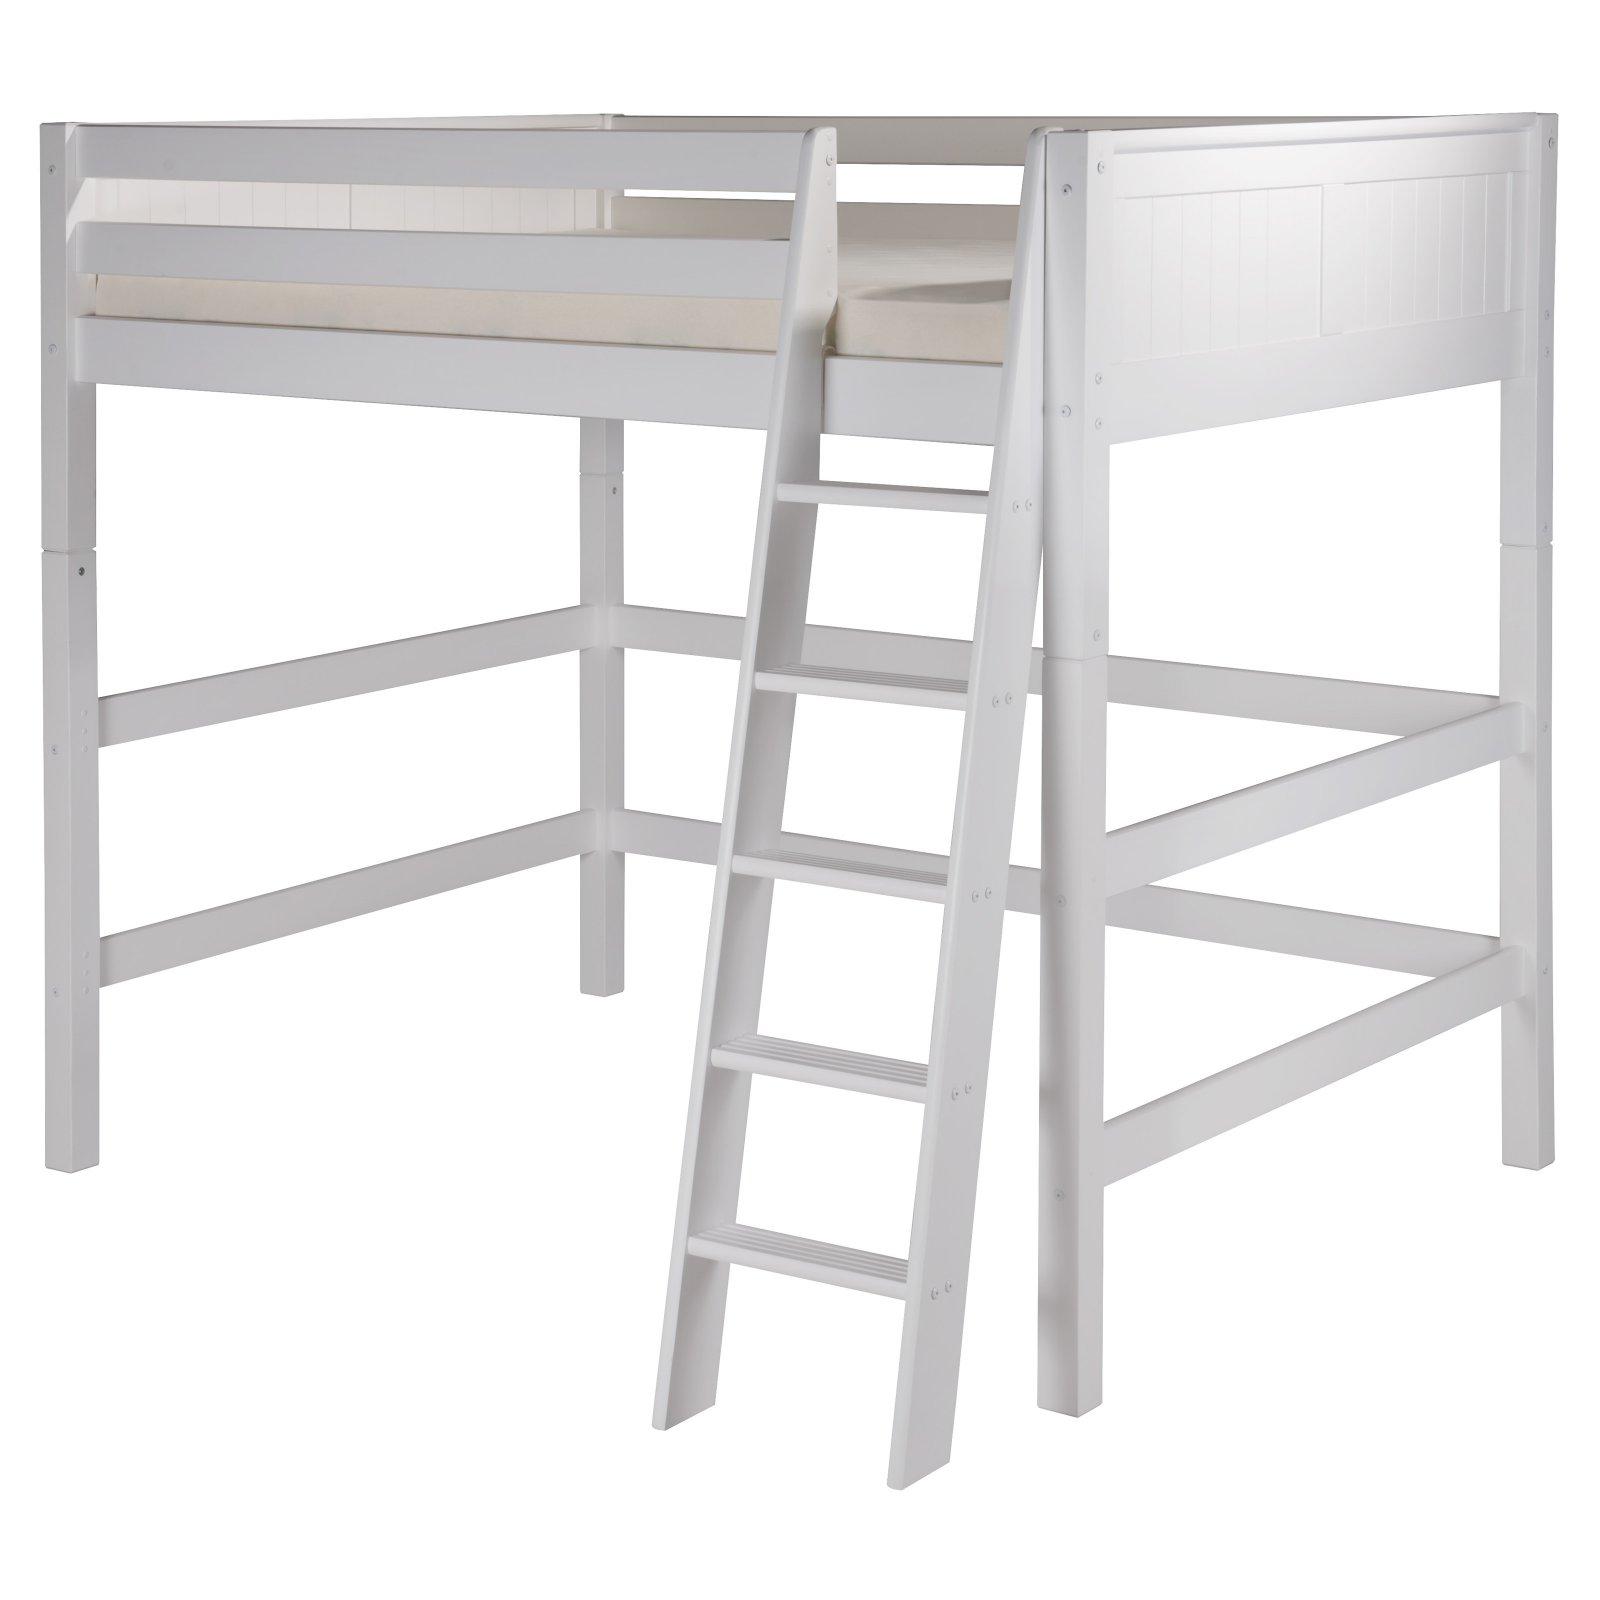 Camaflexi Panel Headboard High Loft Bed